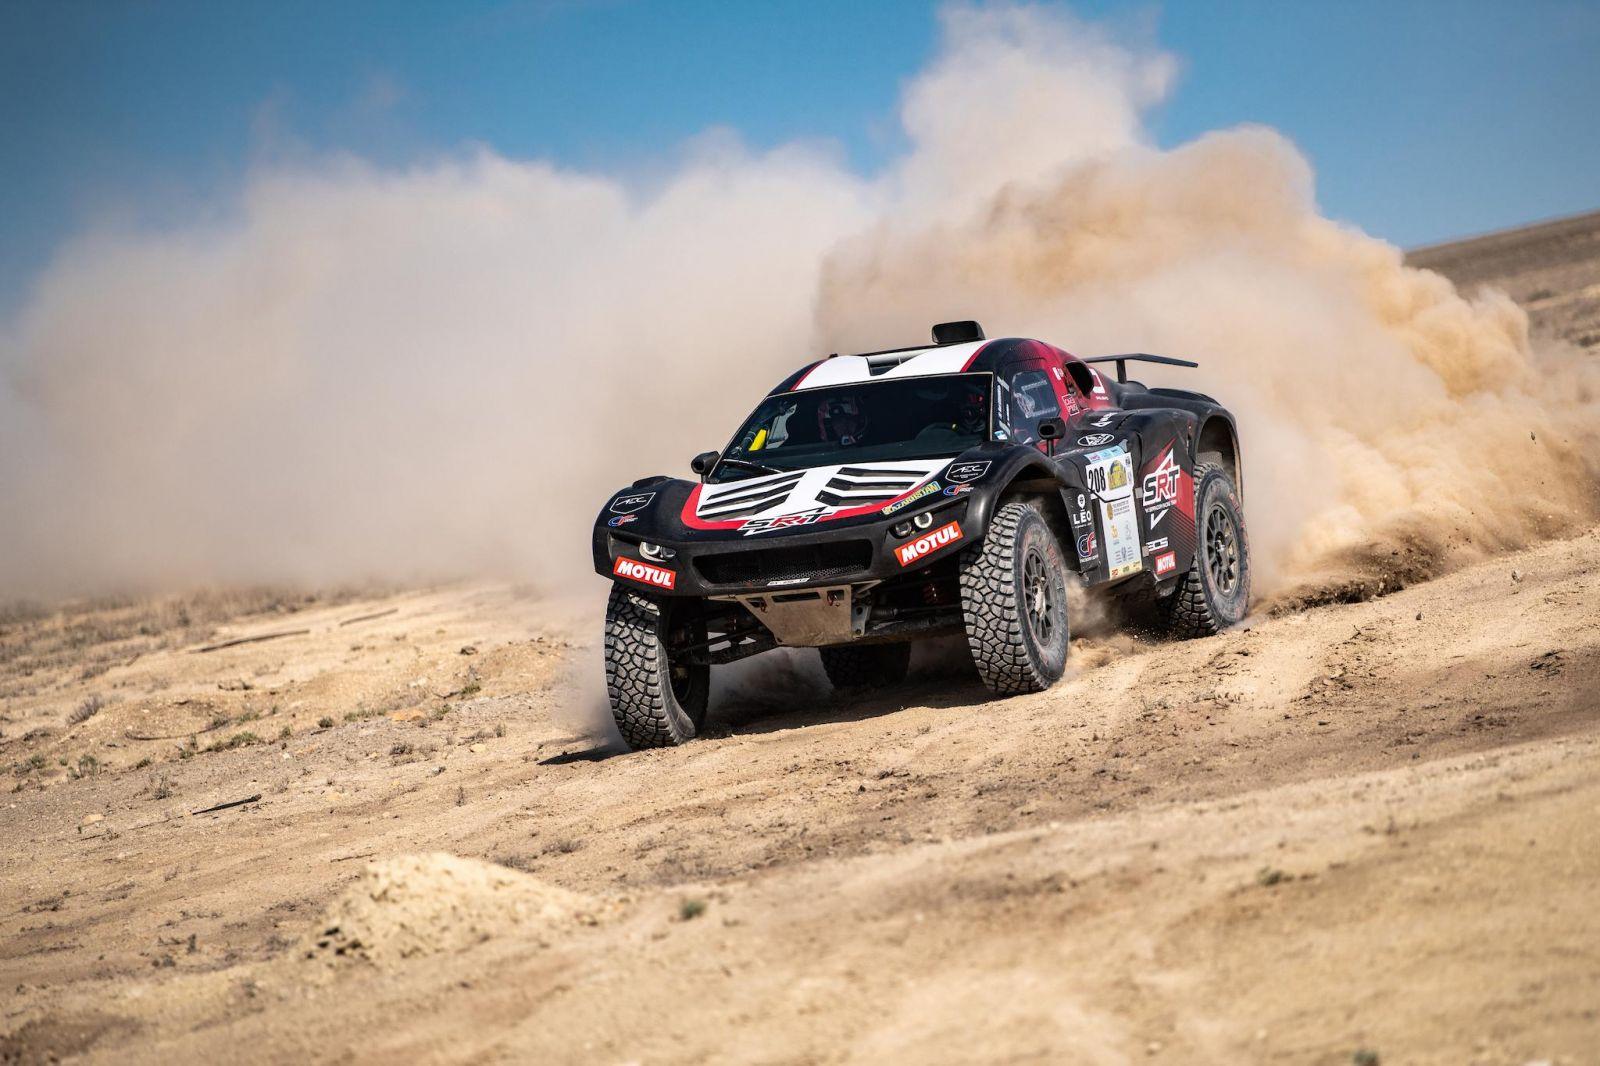 2021-Rally-Kazakhstan-S4-Mathieu-Serradori.jpg